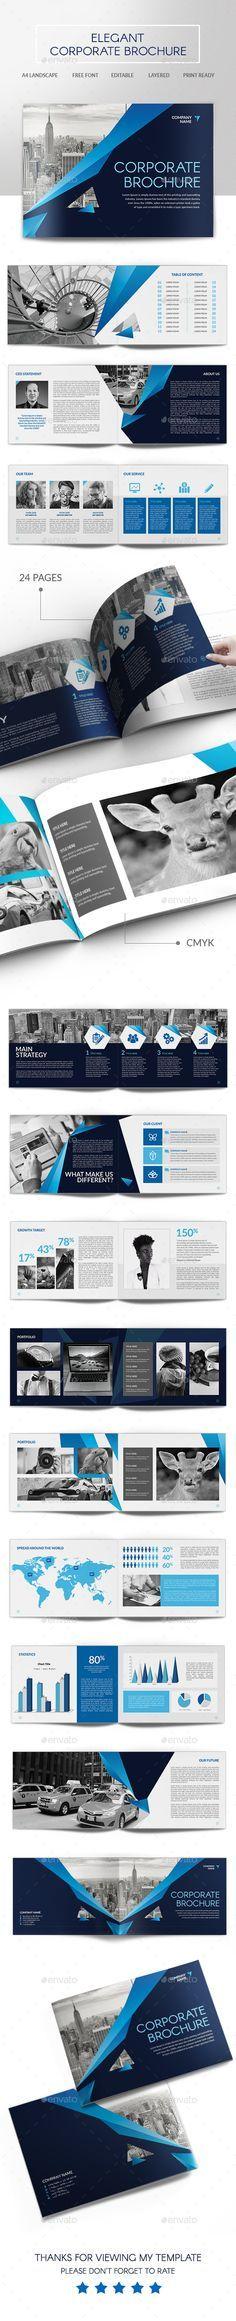 Elegant Corporate Brochure Template #design Download: http://graphicriver.net/item/elegant-corporate-brochure/14333524?ref=ksioks